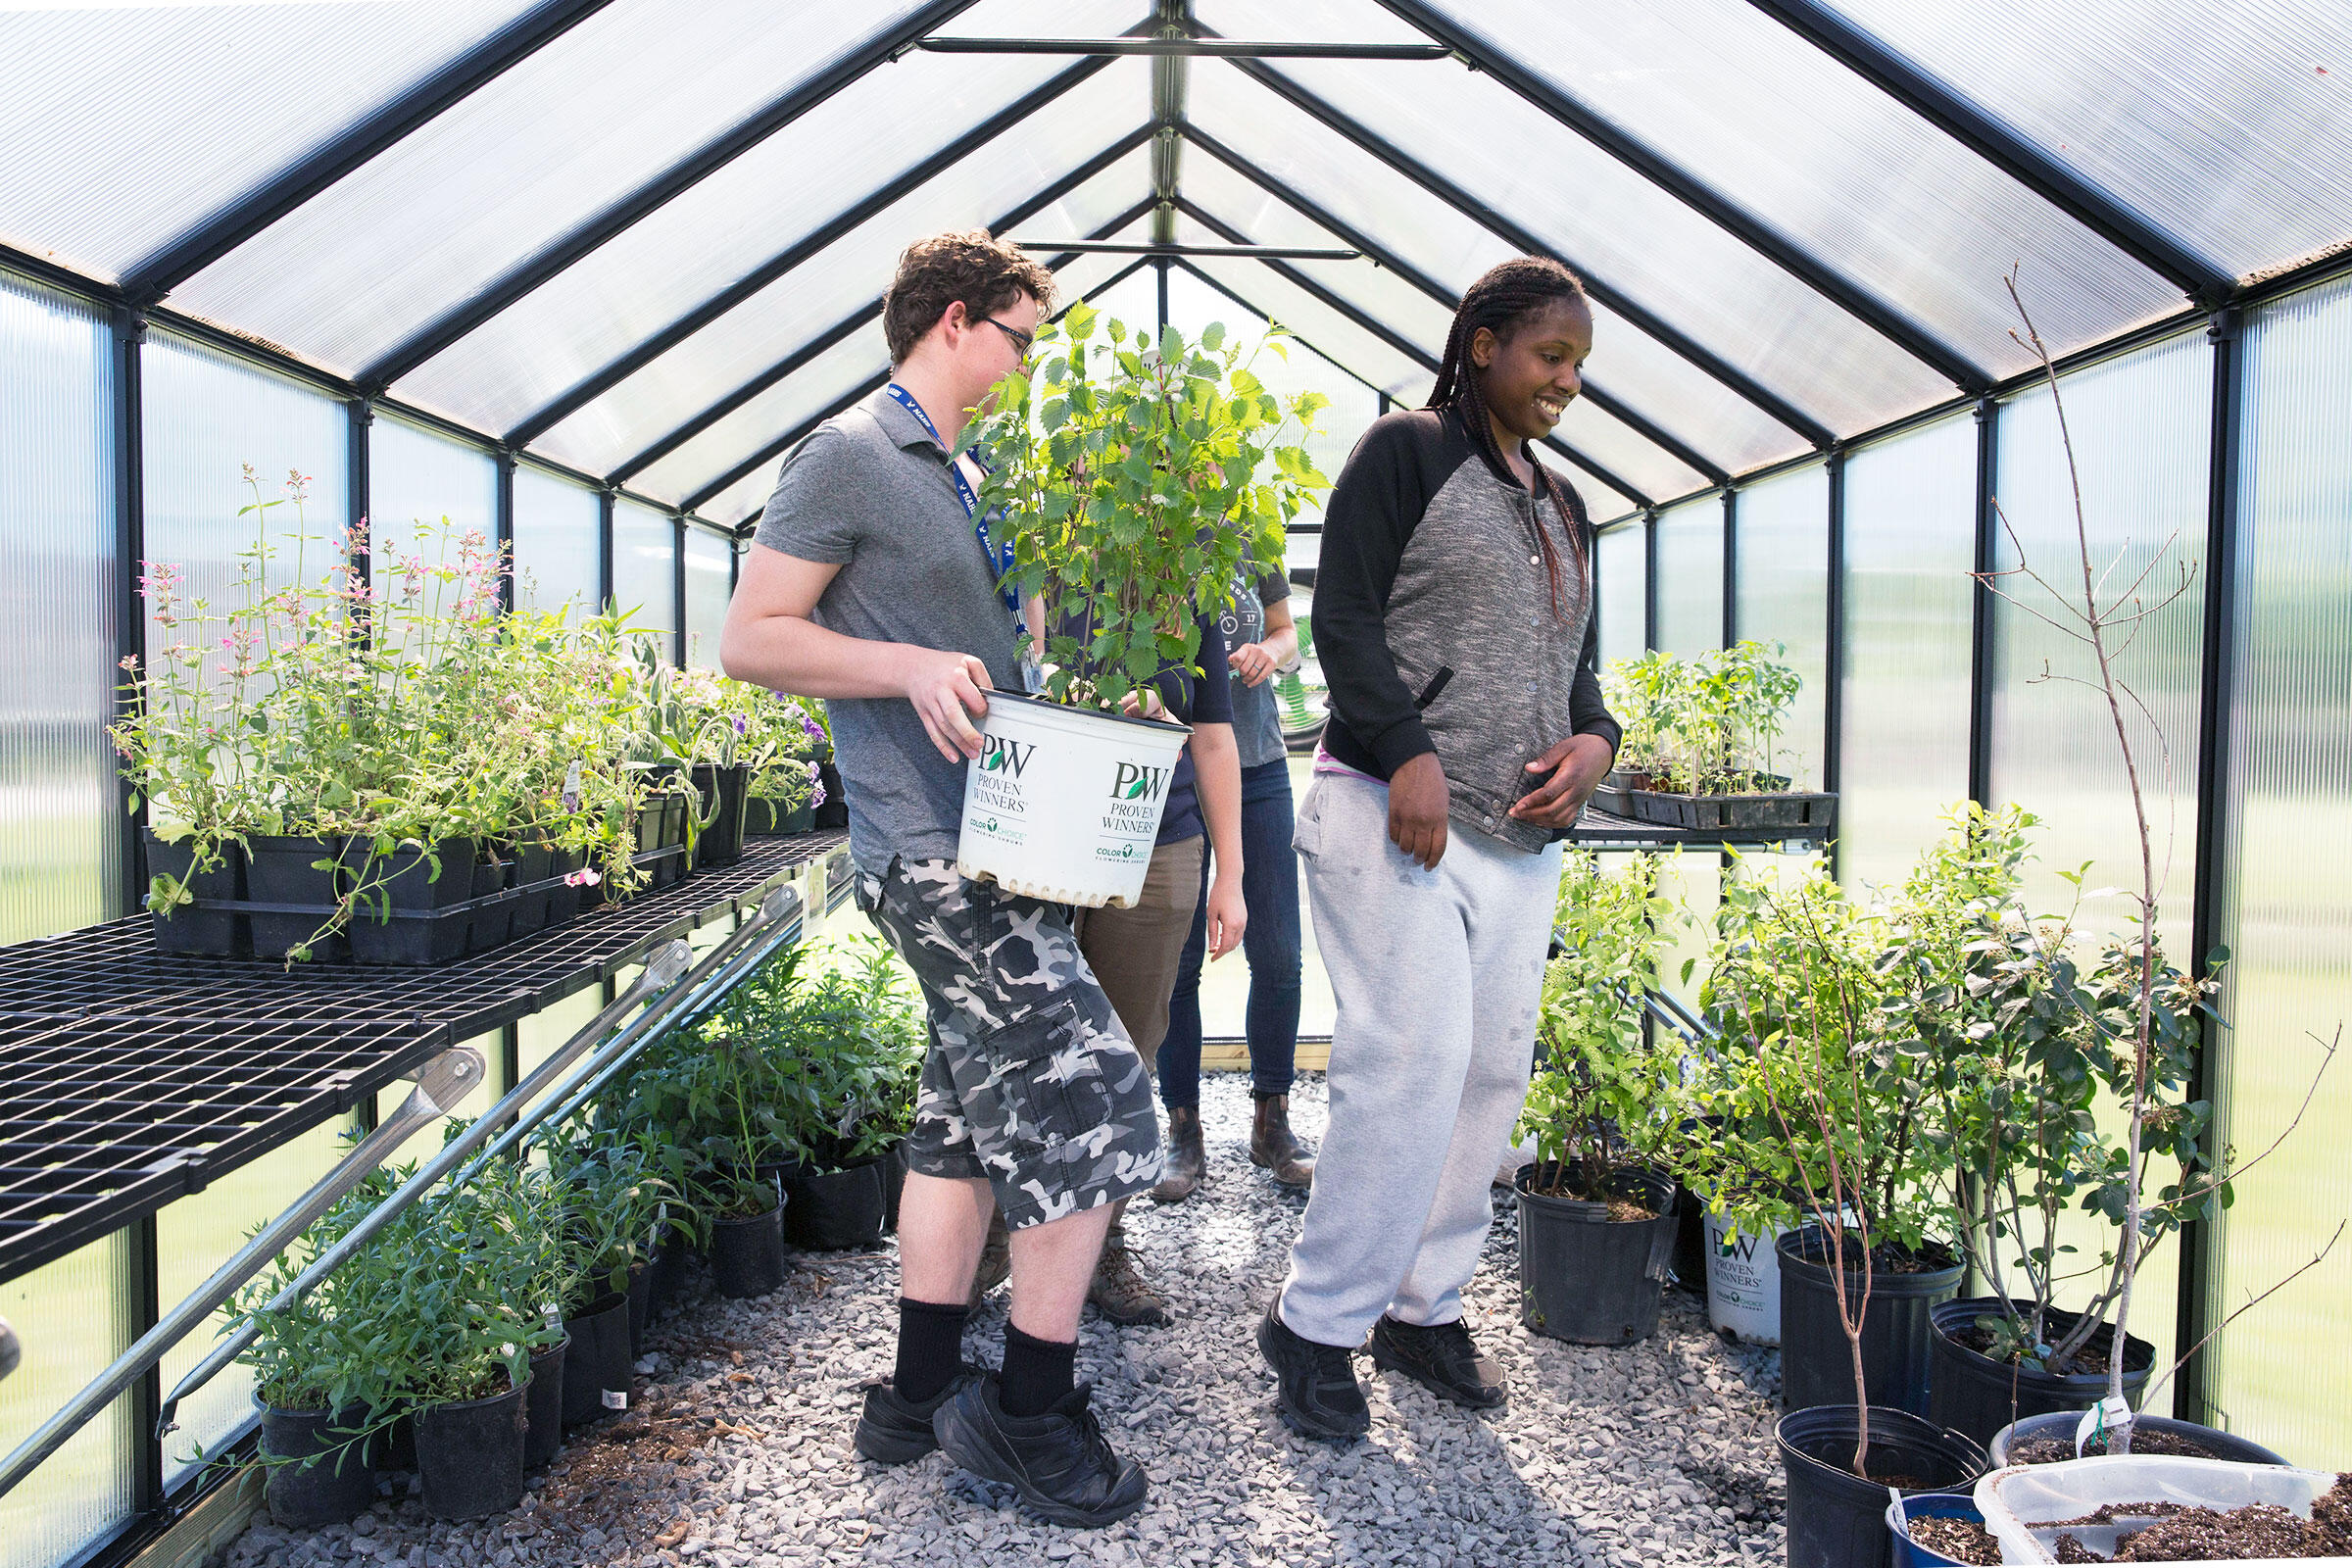 Nathan Cochran and Erika Turner working in the greenhouse at Norristown Area High School. Rachel Wisniewski